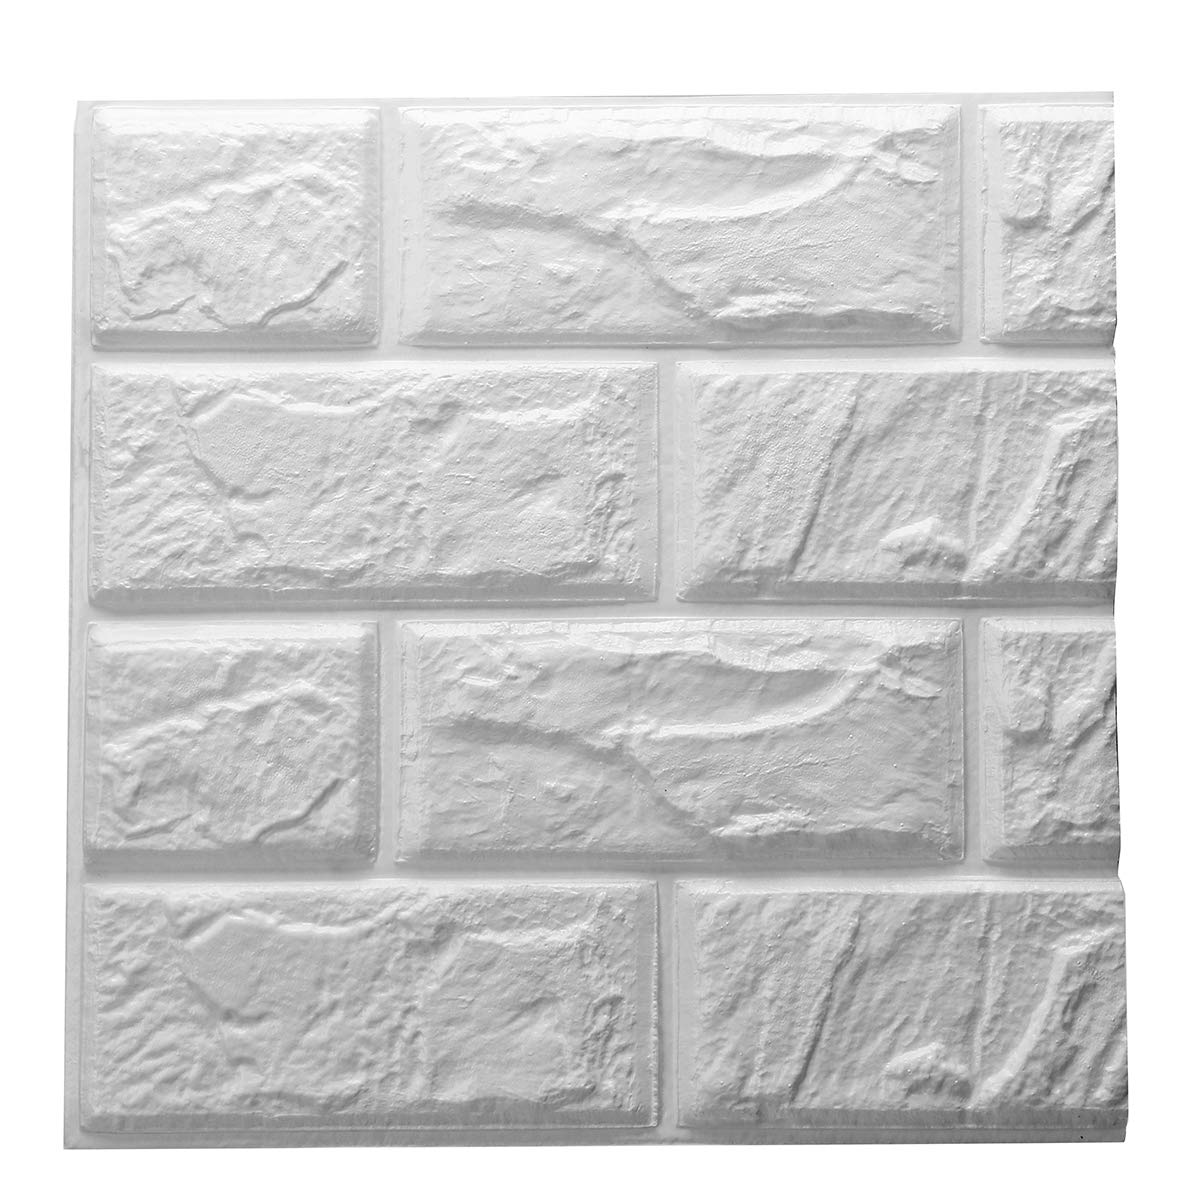 PE Foam 3D Self Adhesive DIY Panels Wall Stickers Home Decor Embossed Brick New